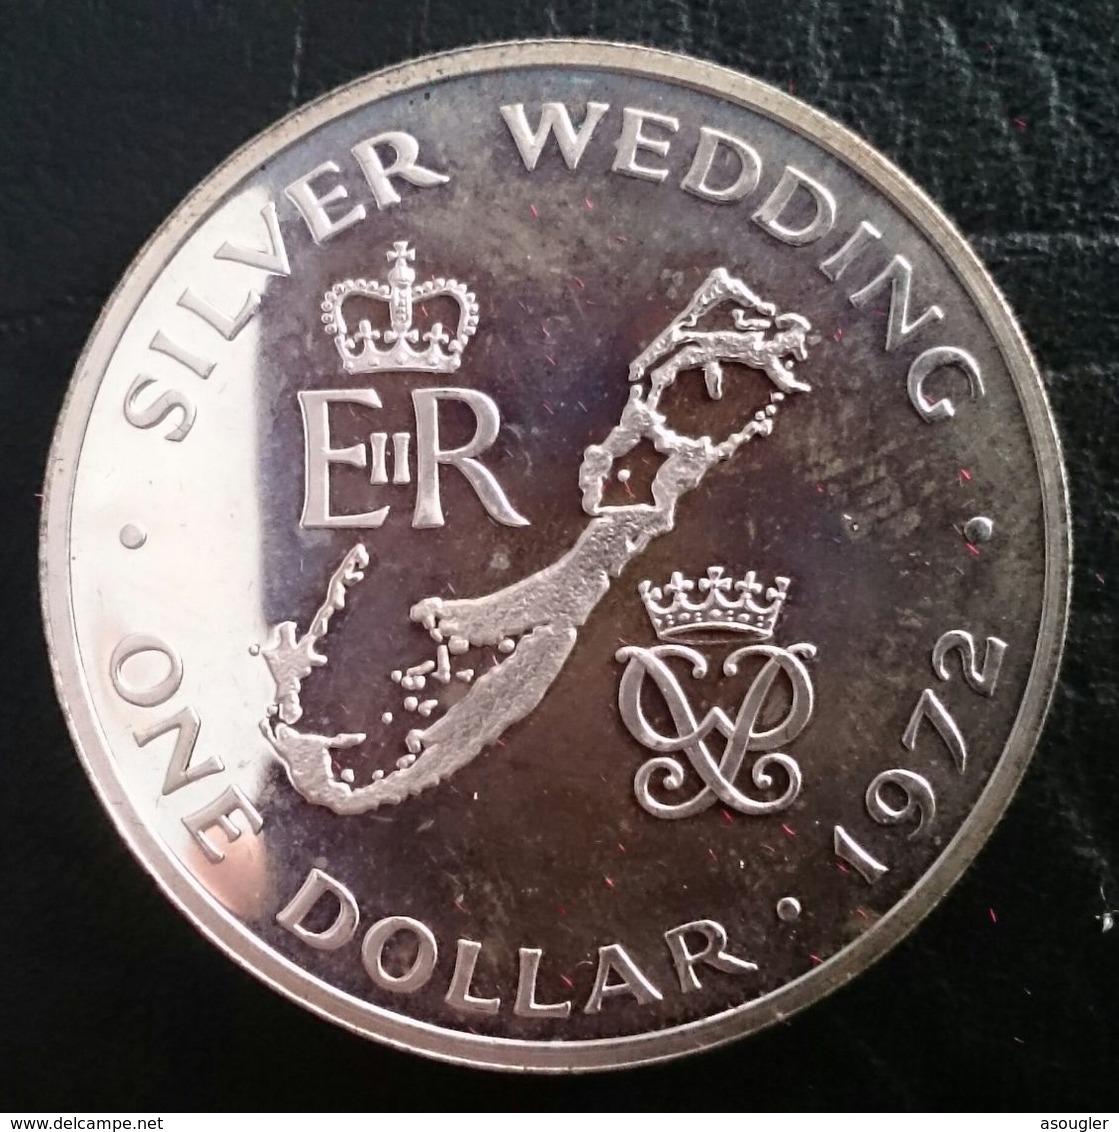 "BERMUDA 1 DOLLAR 1972 SILVER PROOF ""Silver Wedding Anniversary"" Free Shipping Via Registered Air Mail - Bermudes"